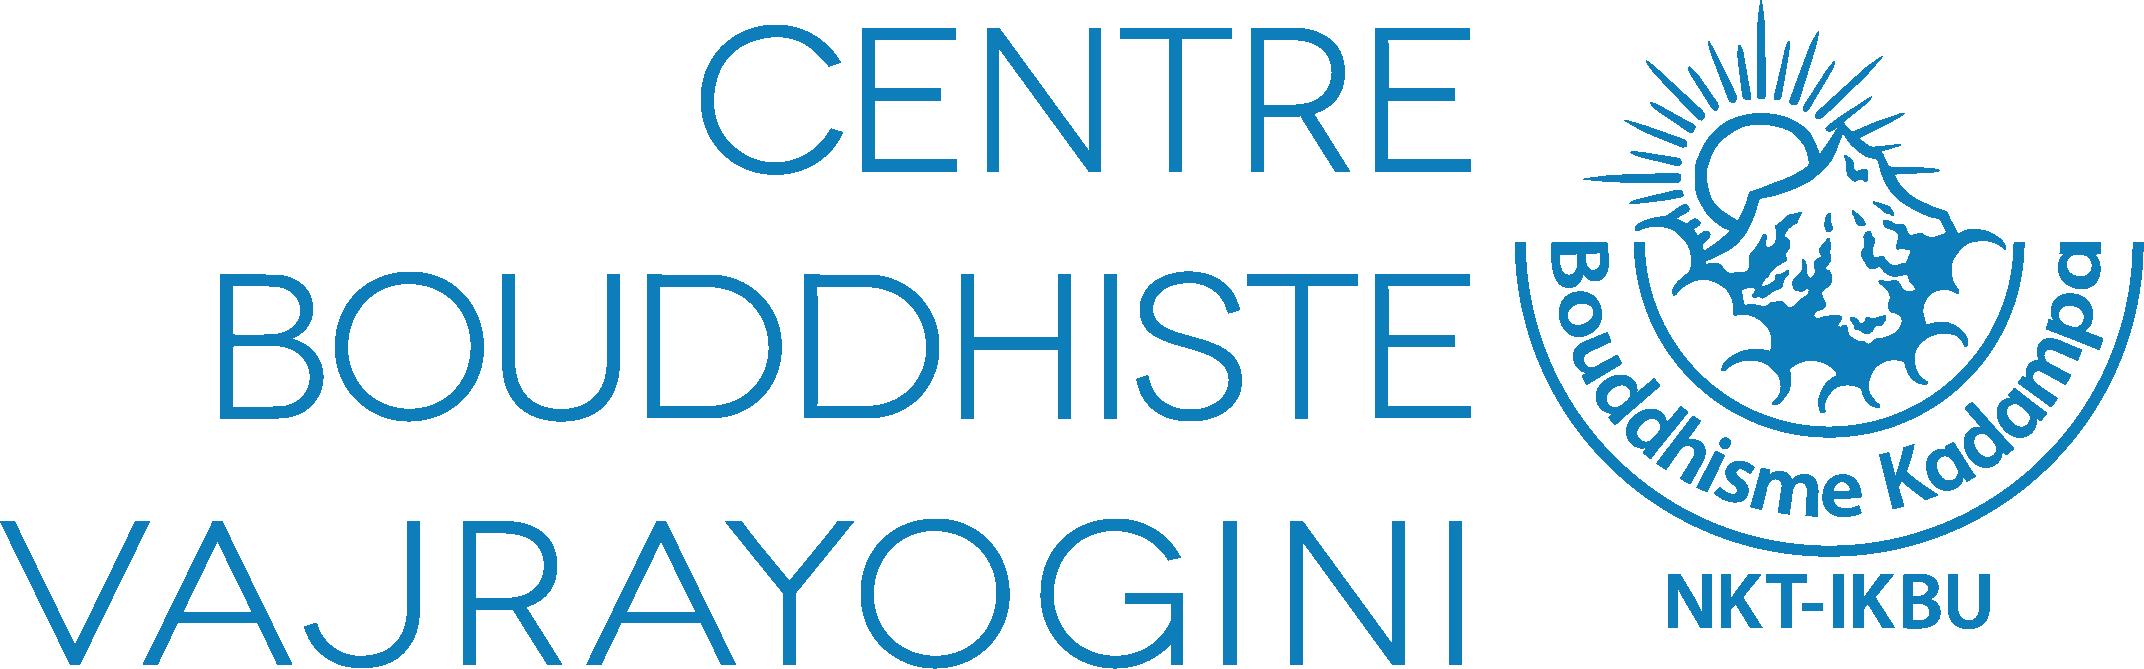 Centre bouddhiste Vajrayogini